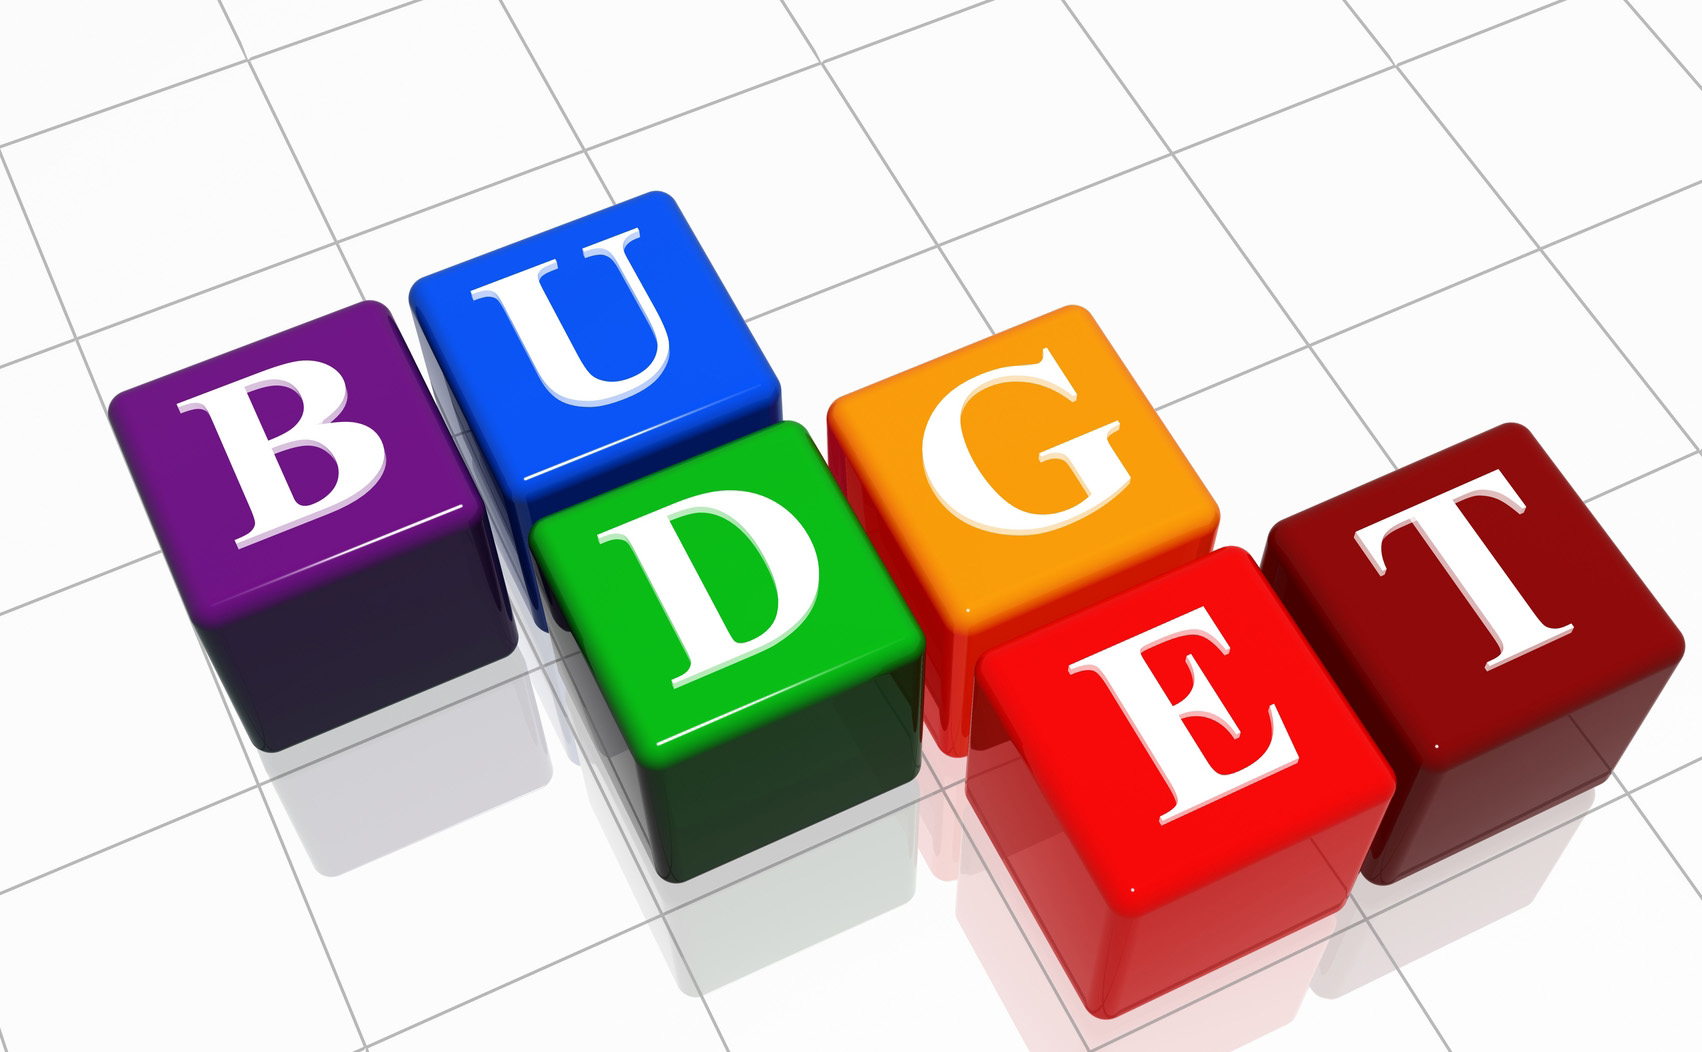 bd-budget